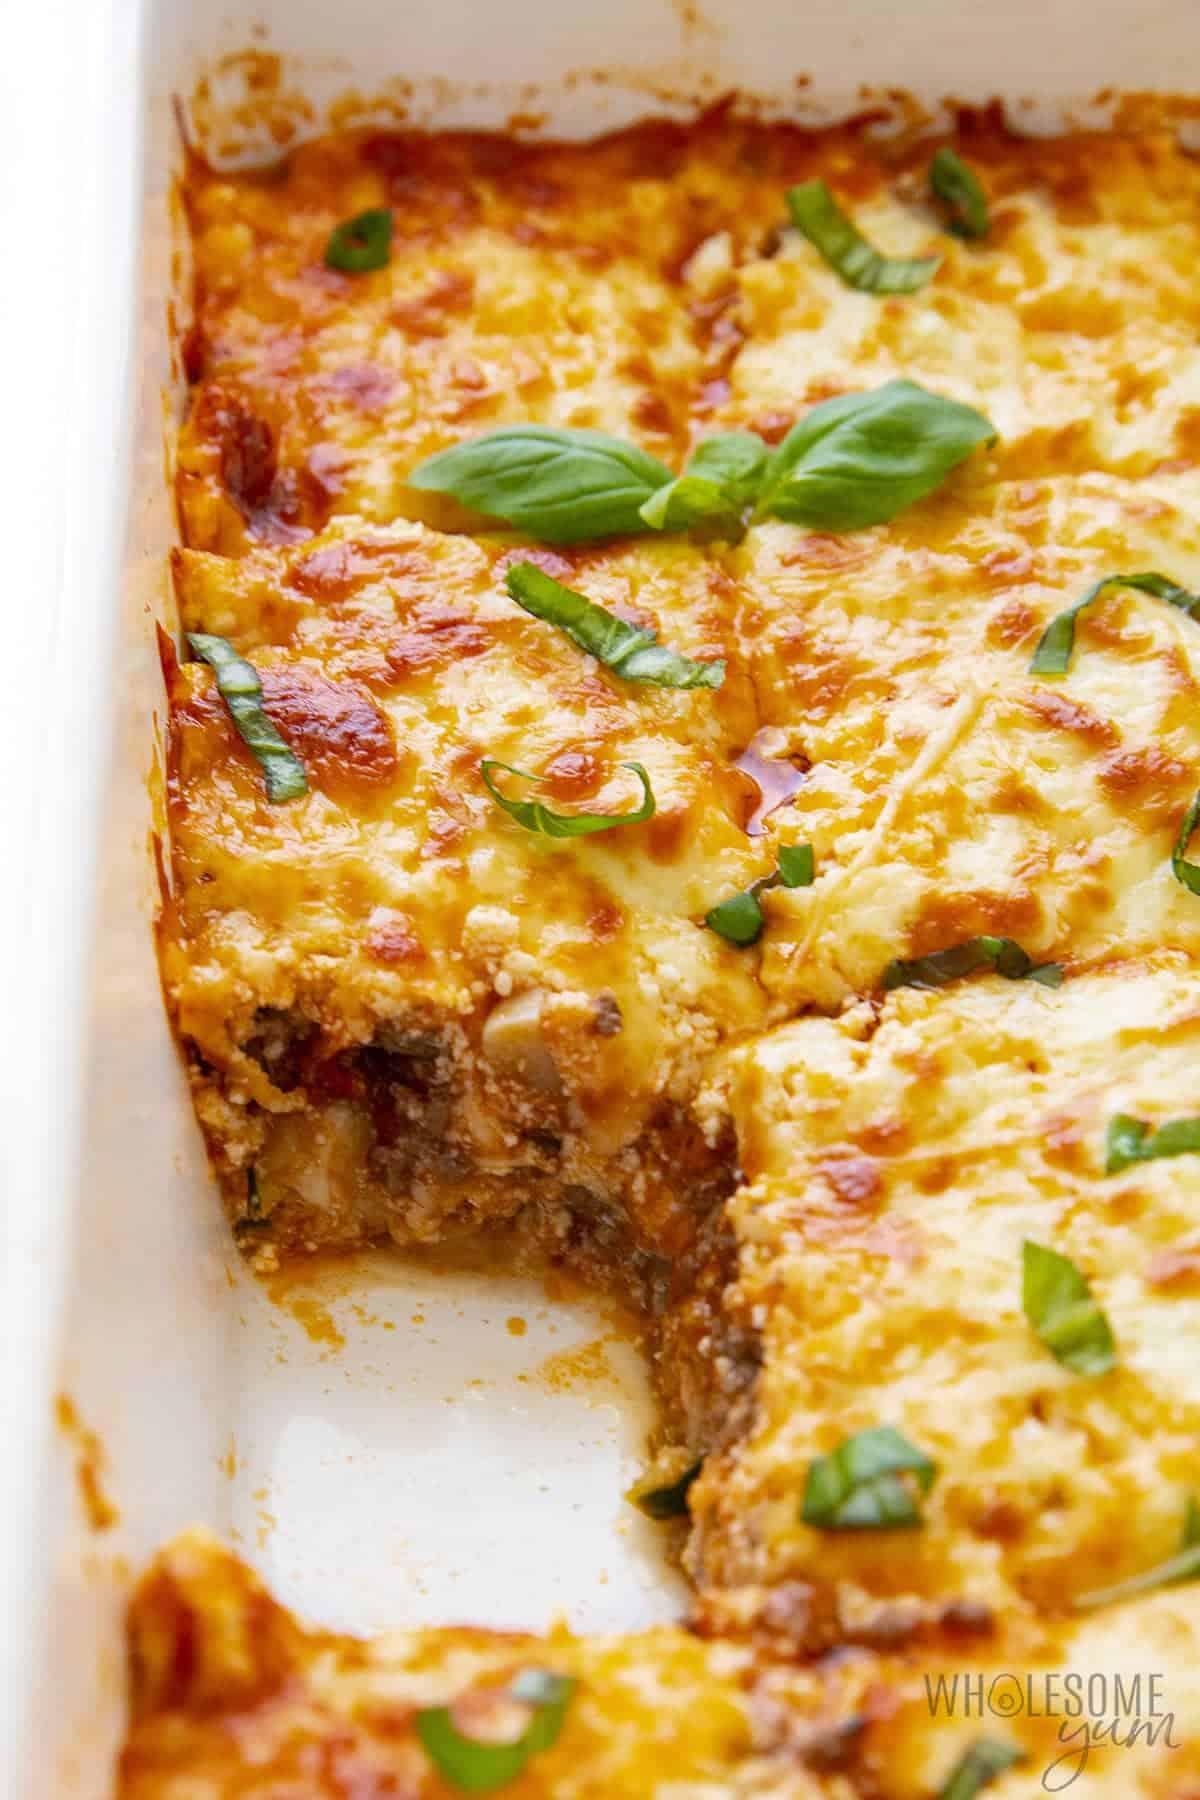 Pan of keto zucchini lasagna showing the inside layers